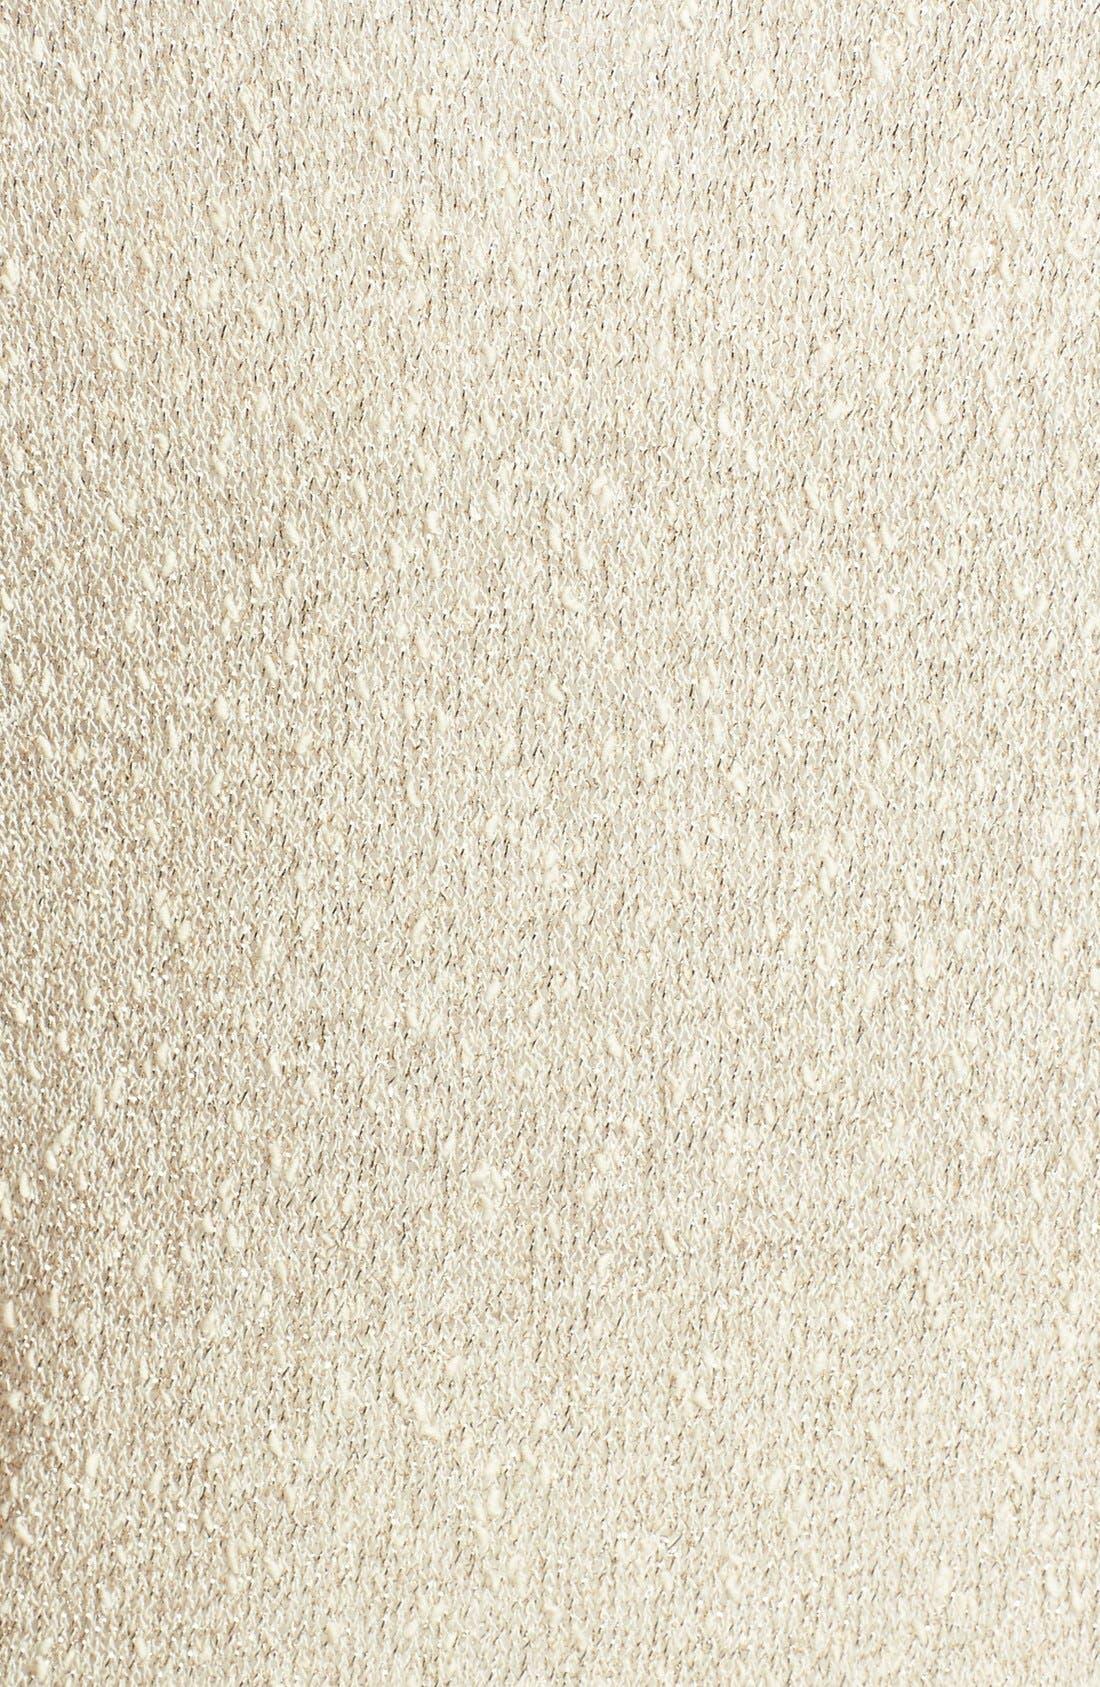 Alternate Image 3  - Tommy Bahama 'Pelosa' Metallic Knit Pullover